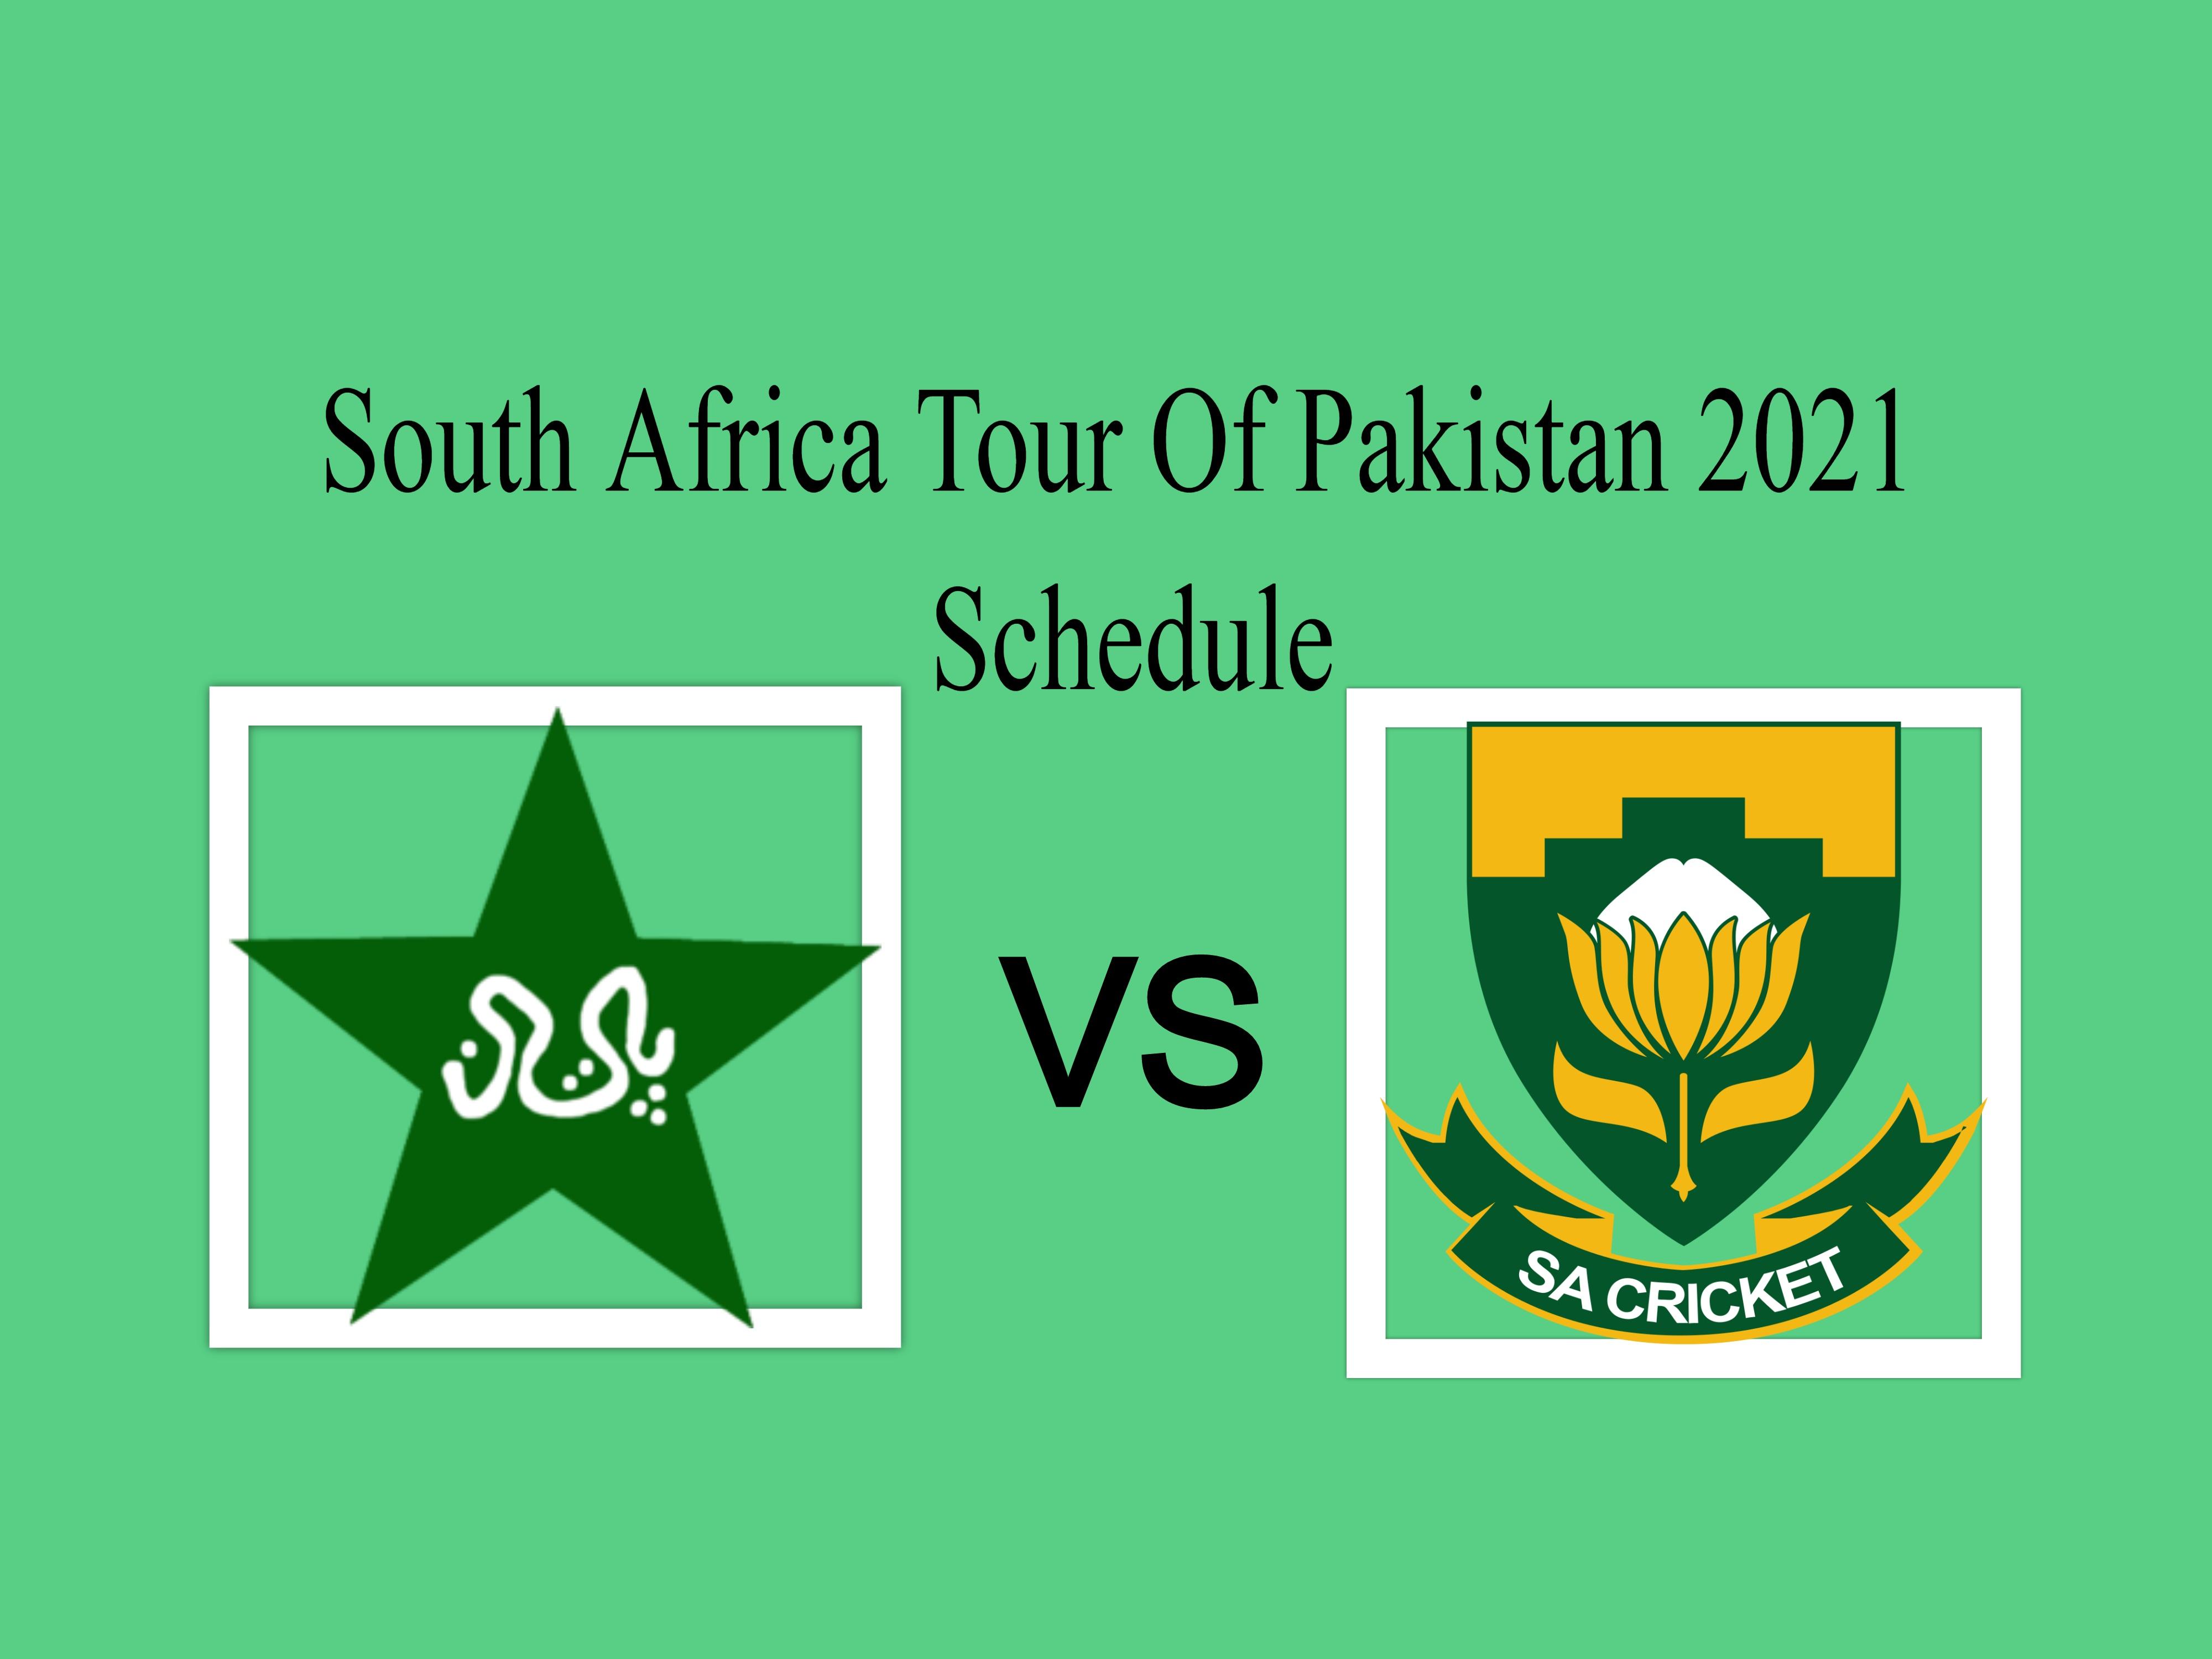 Pakistan vs South Africa 2021 Schedule